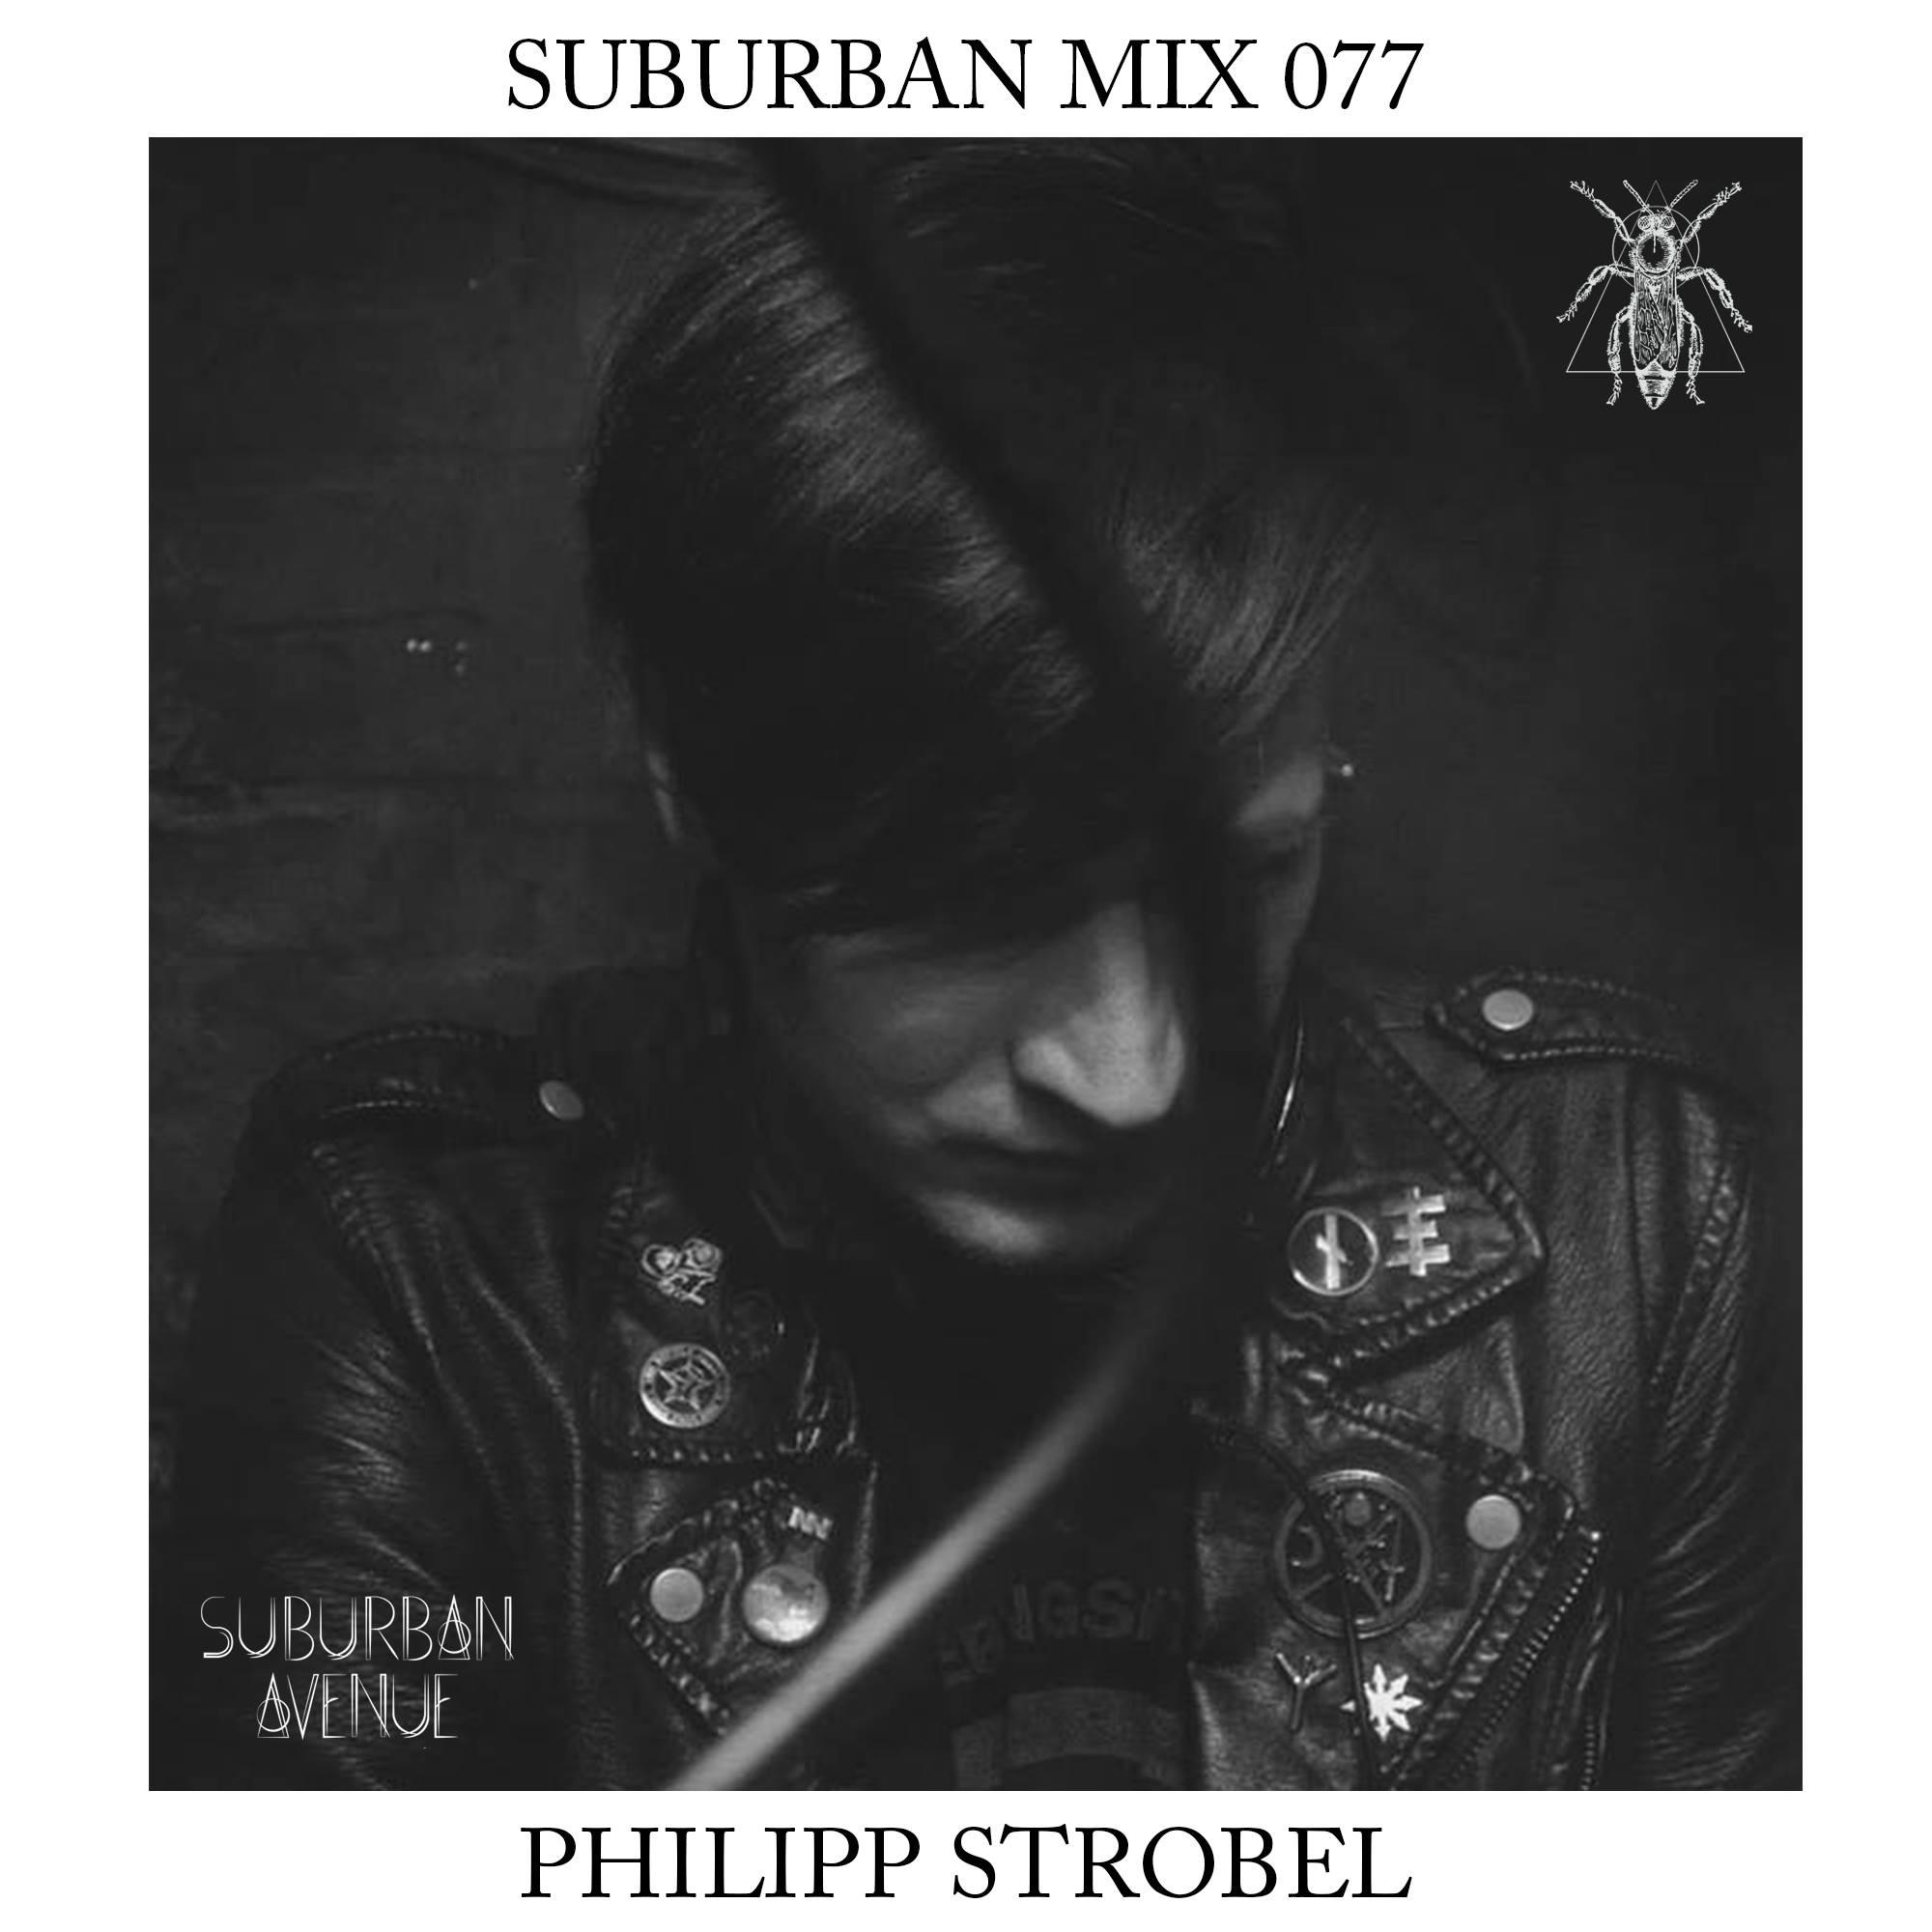 Suburban Mix 077 - Philipp Strobel